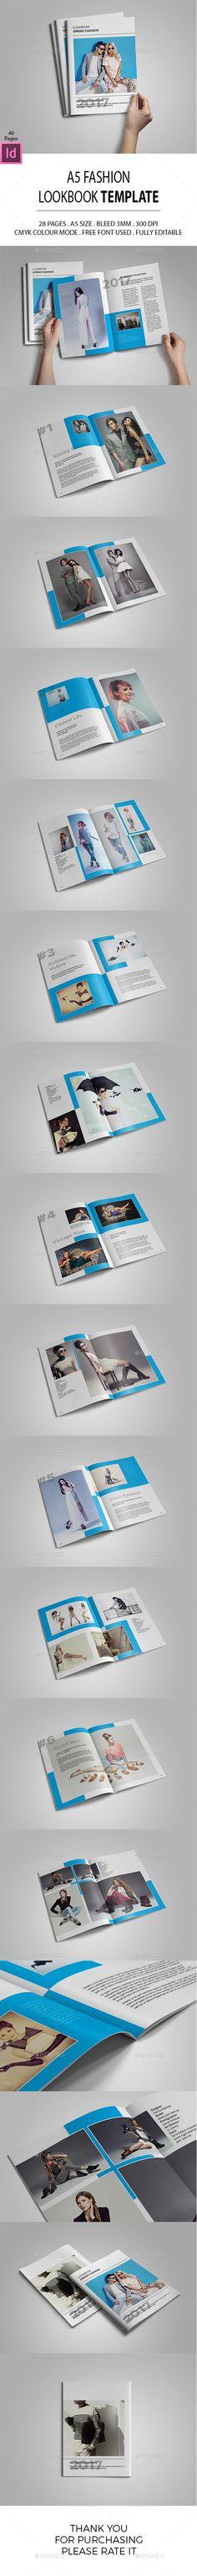 A5 Lookbook Template - Catalogs Brochures Download here : https://graphicriver.net/item/a5-lookbook-template/19466081?s_rank=44&ref=Al-fatih